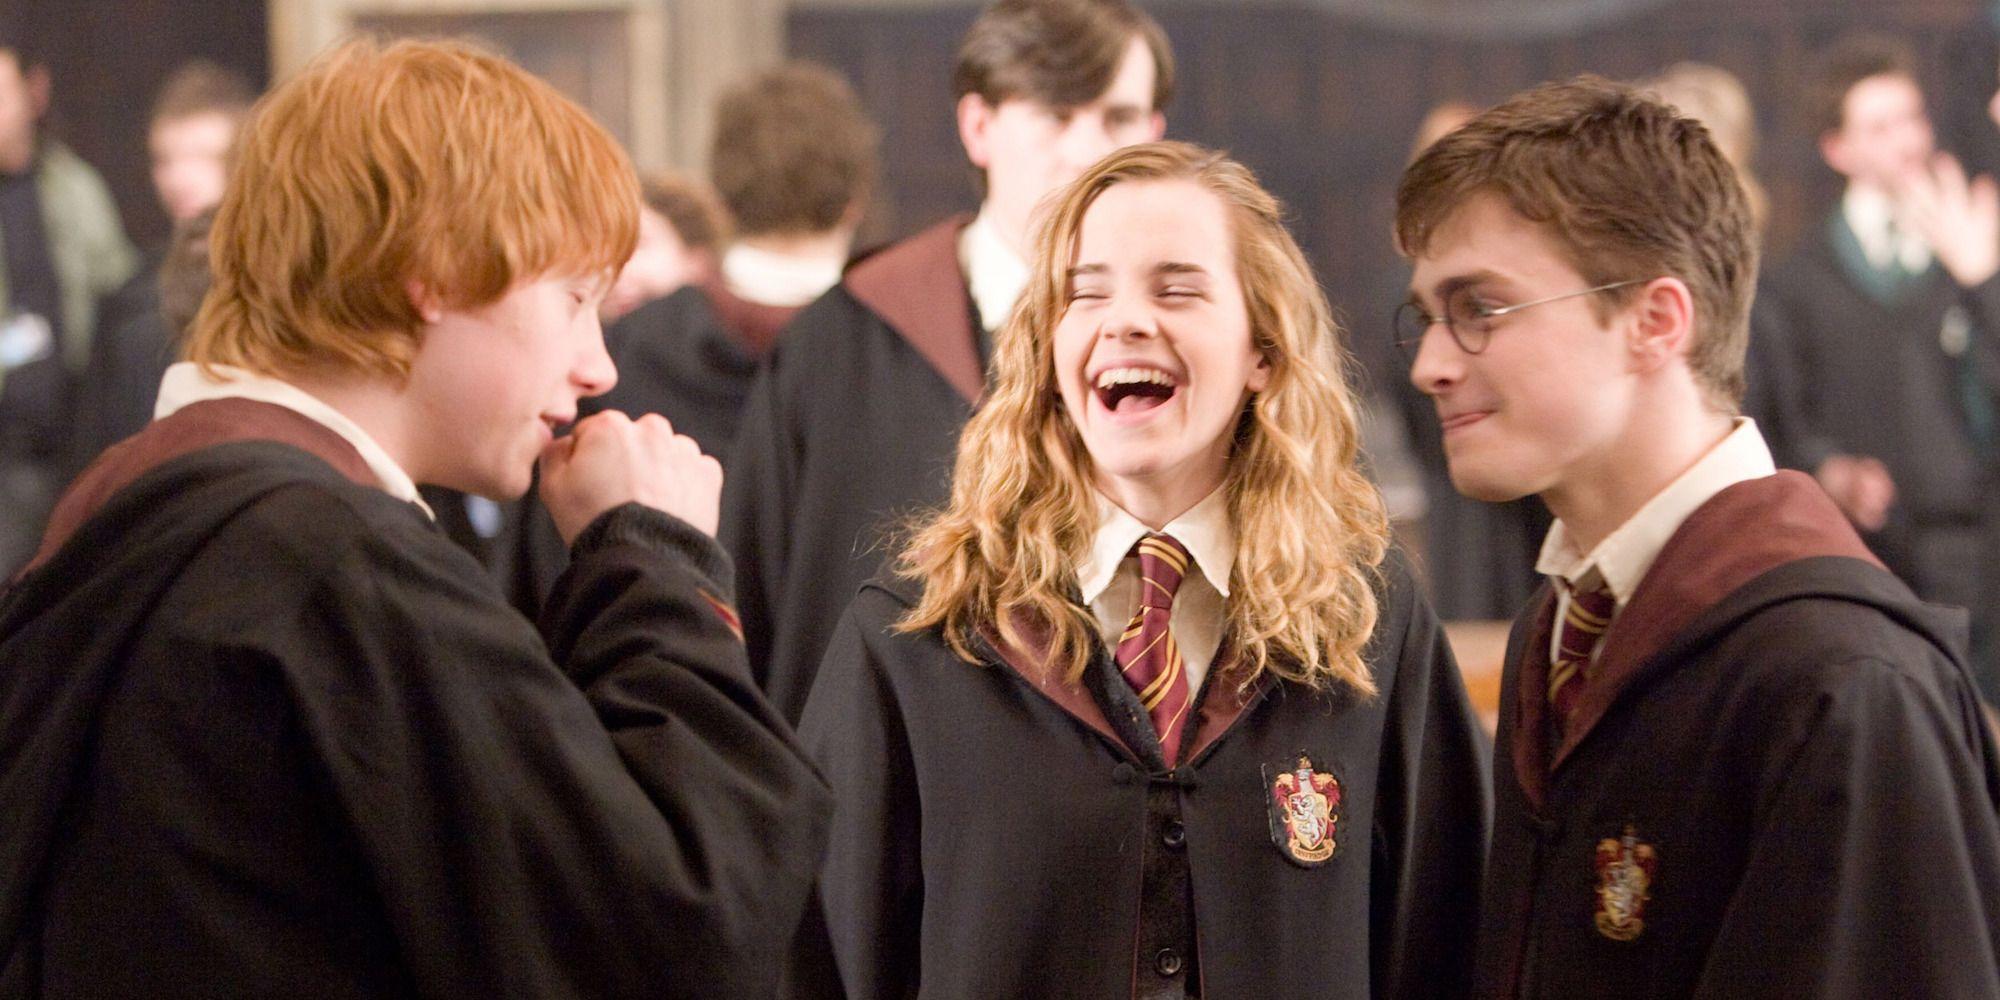 Fantastic Wallpaper Harry Potter Friend - Harry-Potter-funny-wallpaper  Image_232278.jpg